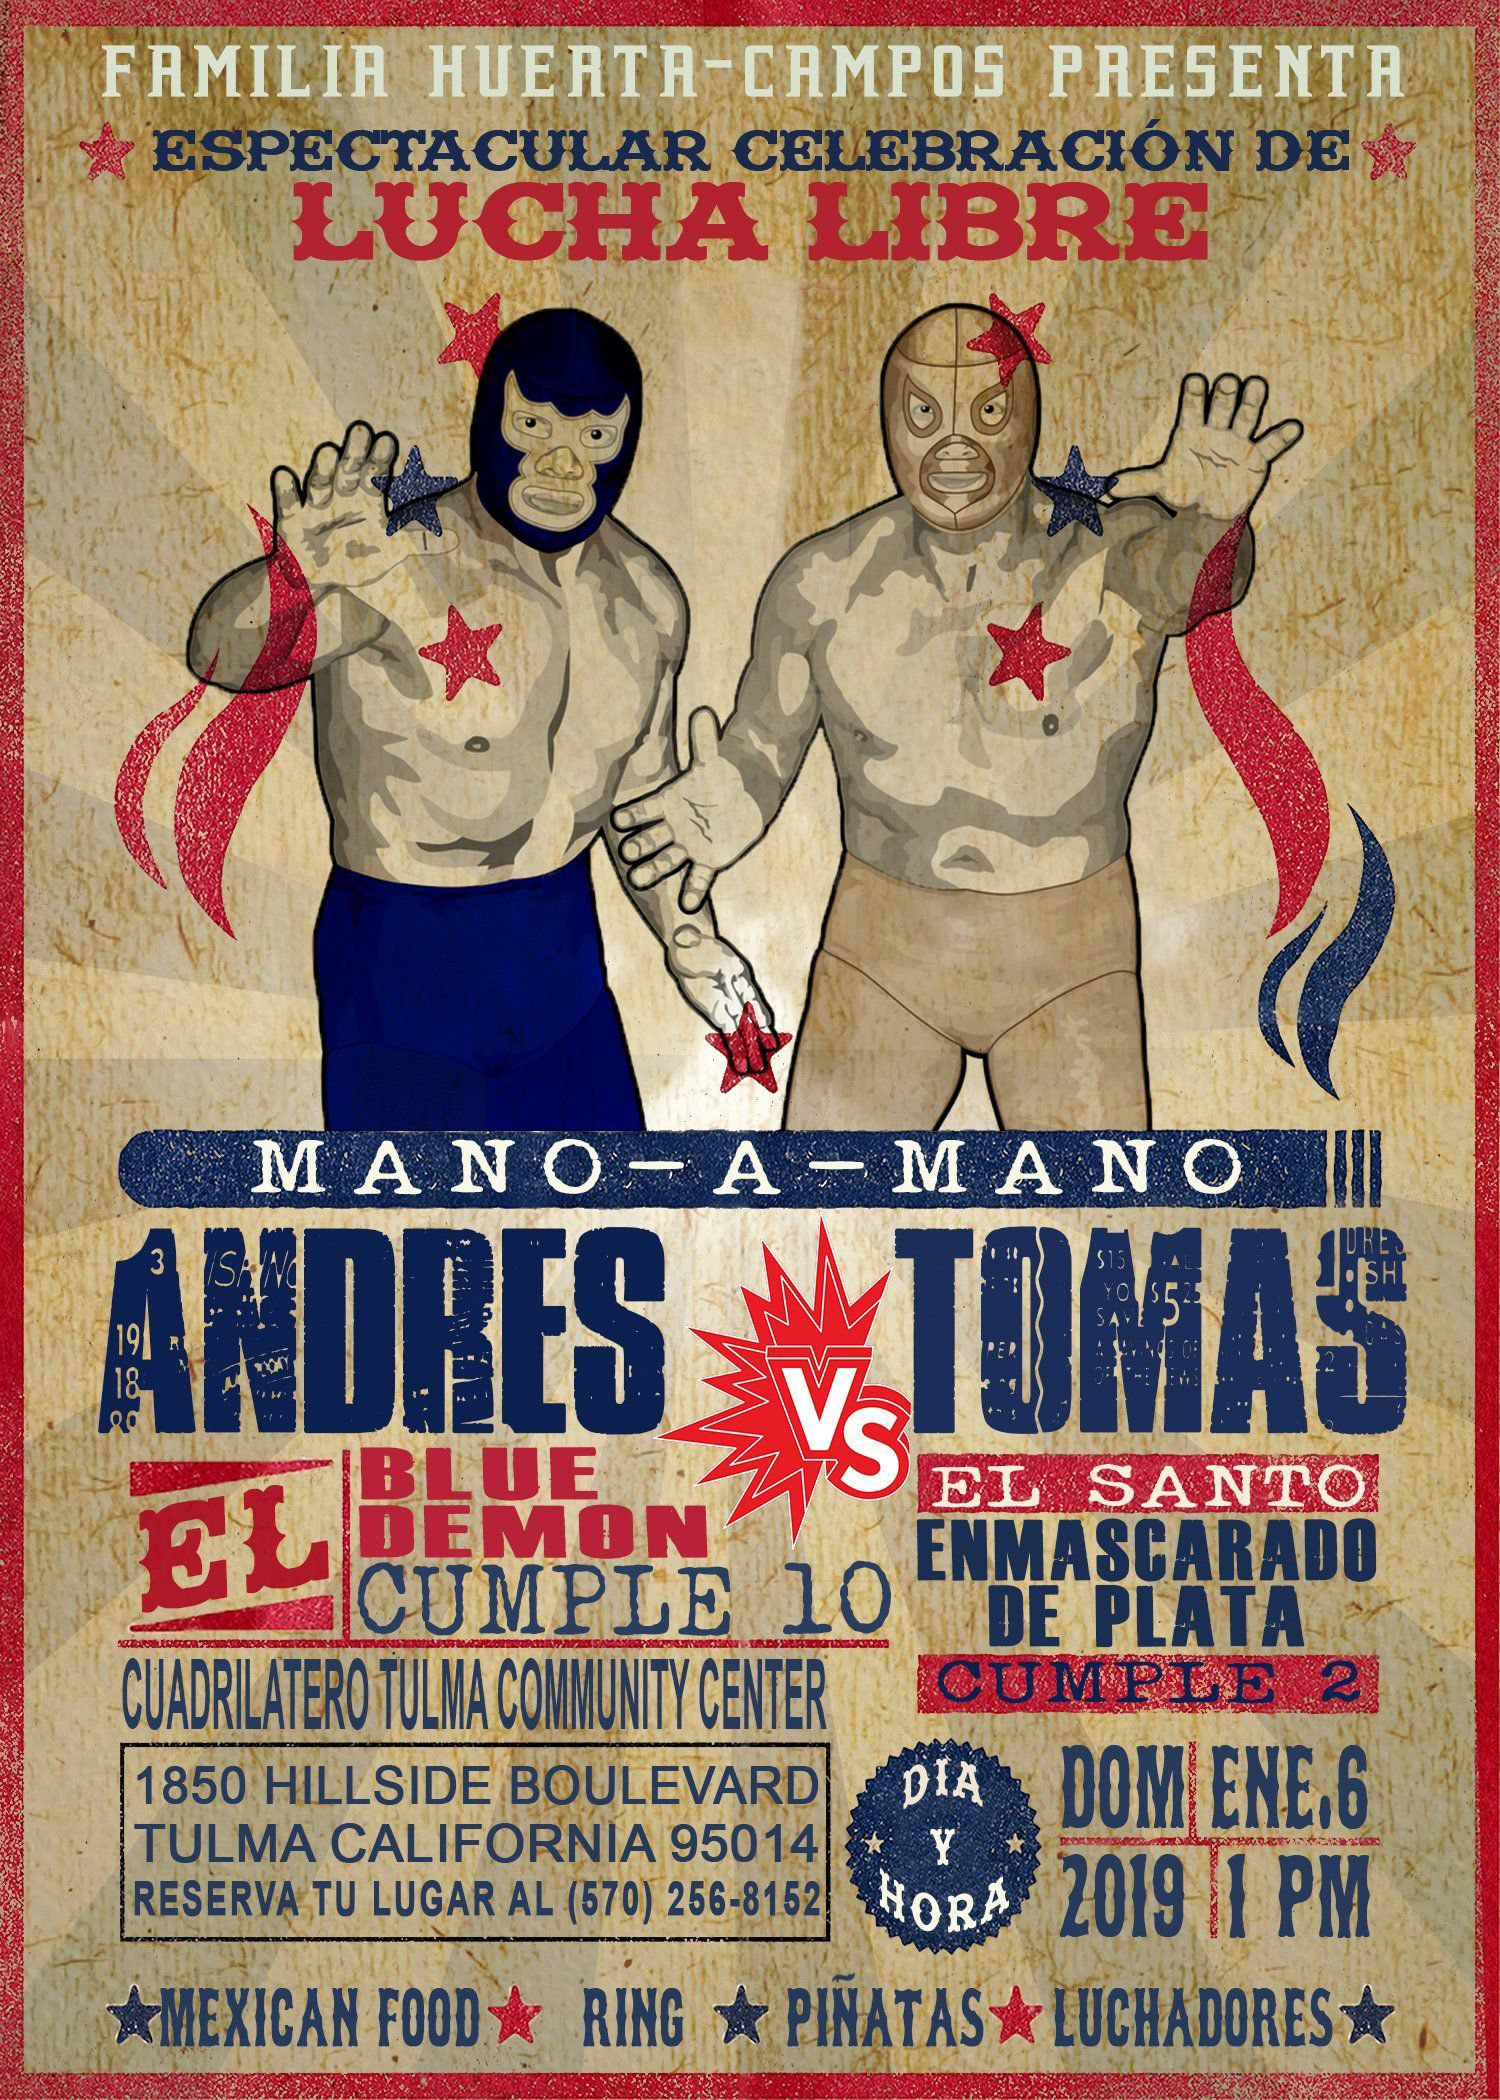 Mexican El SANTO luchadores Mexico Lucha libre Toy Wrestler Package Of 6 Figures